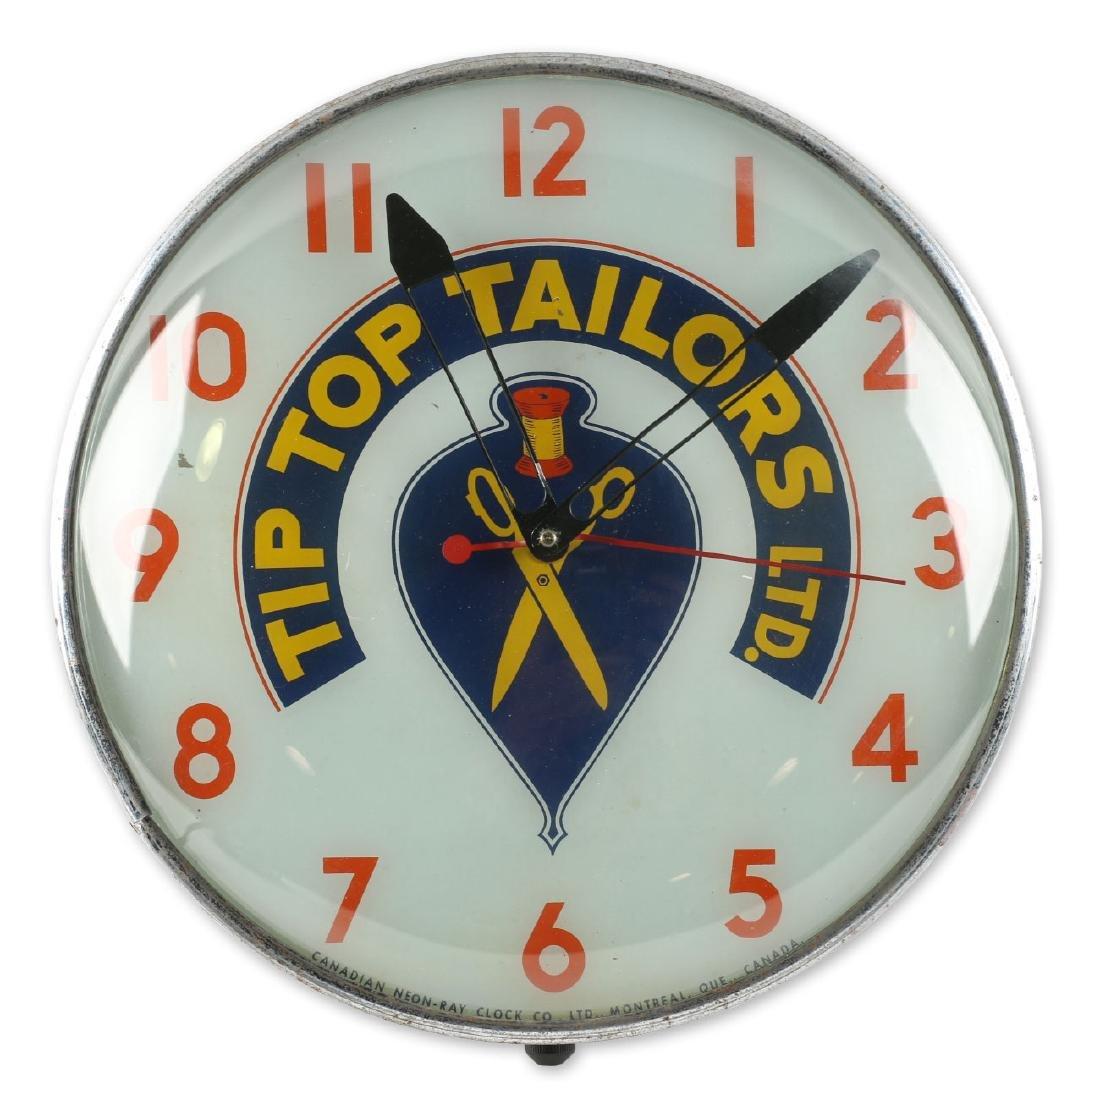 Tip Top Tailors Back-Lit Advertising Clock